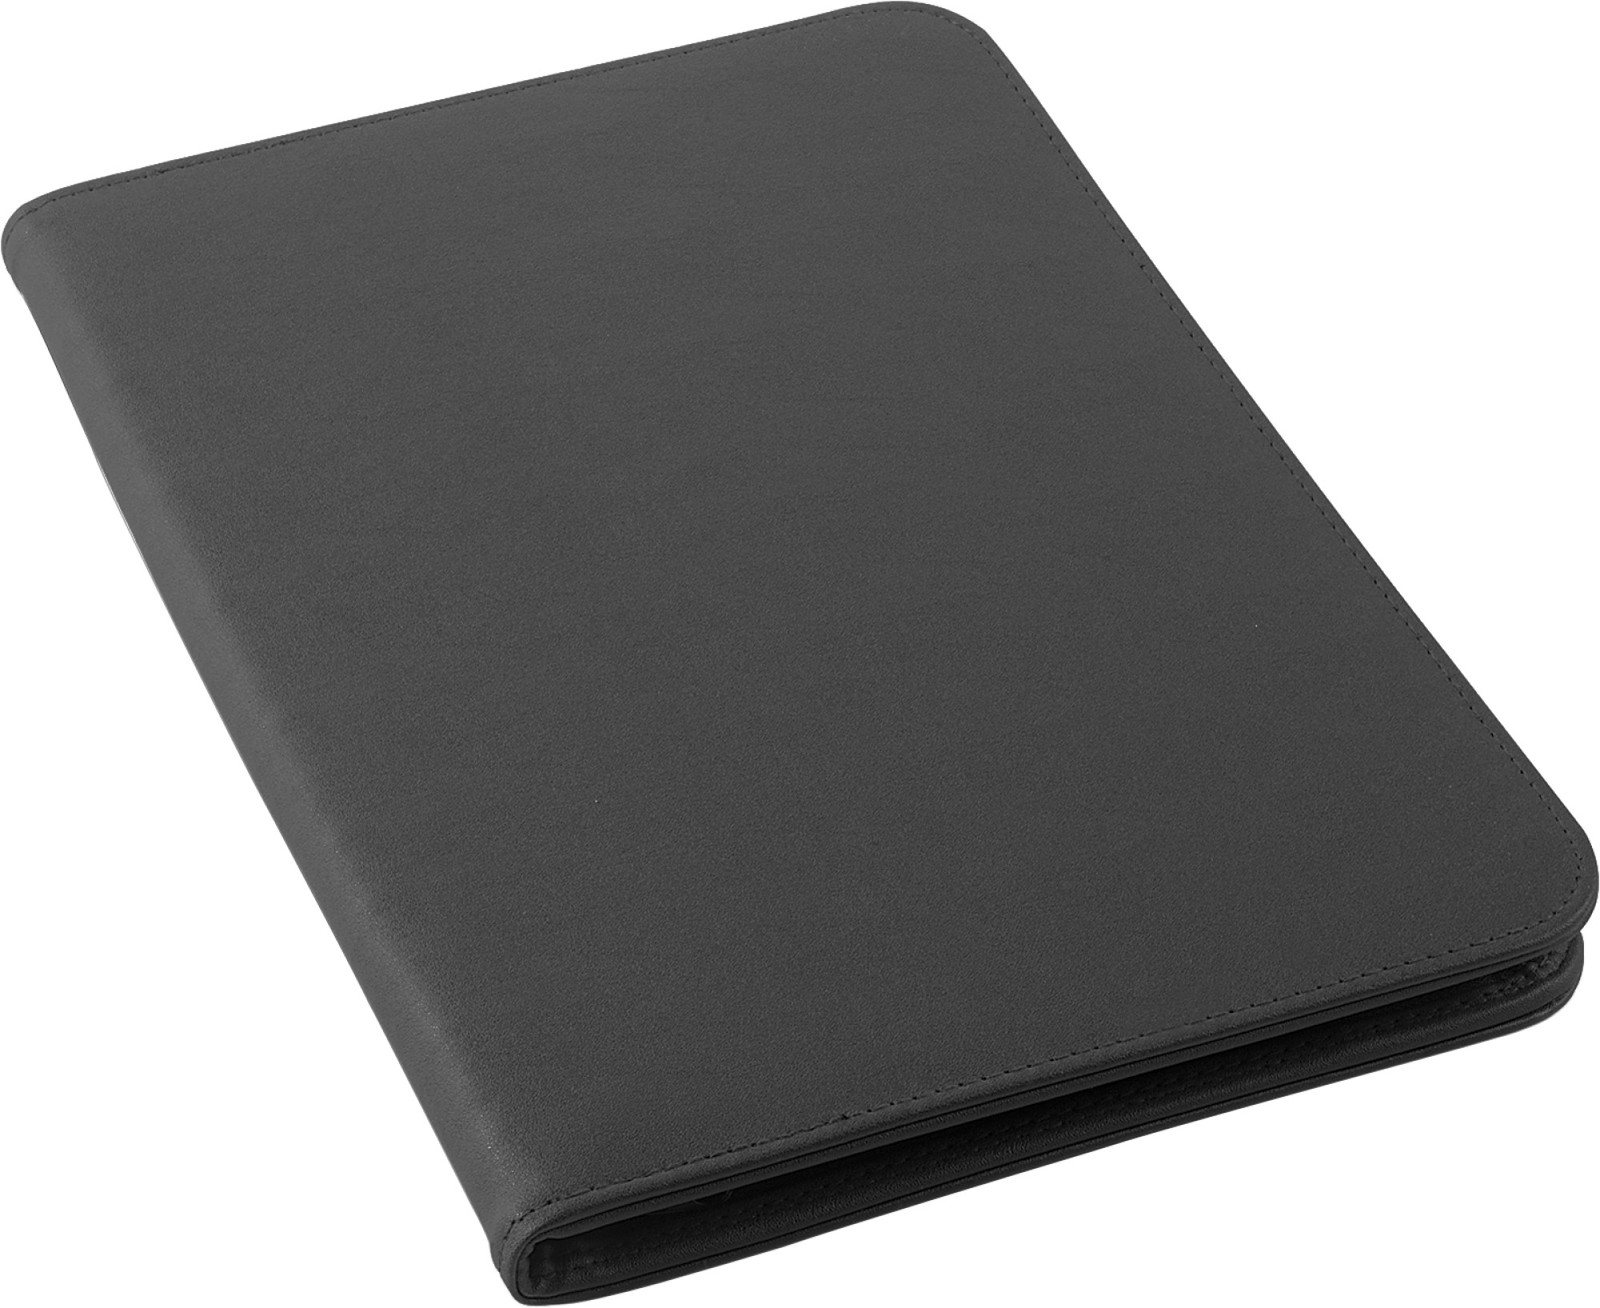 PU conference folder - Black